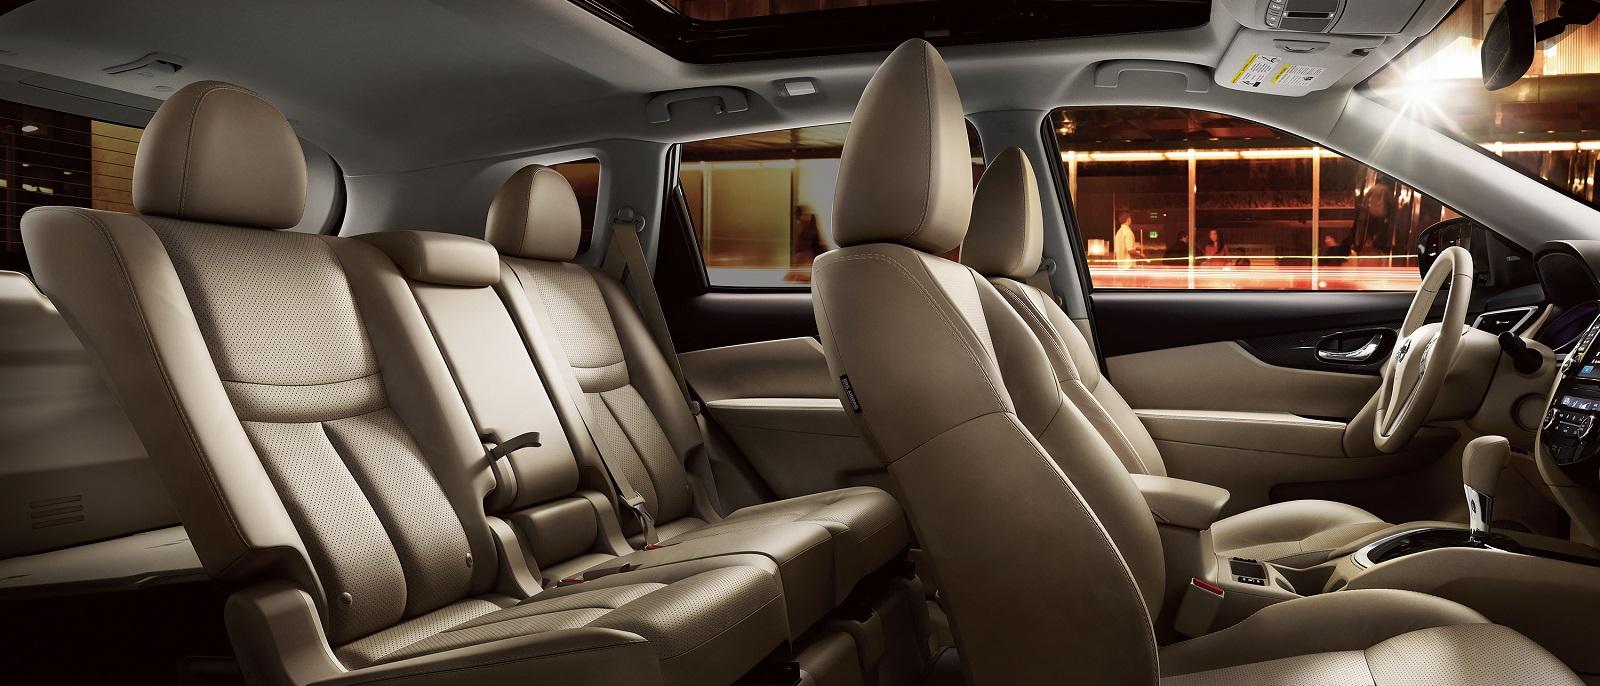 2016-nissan-rogue-folding-seats-almond-leather